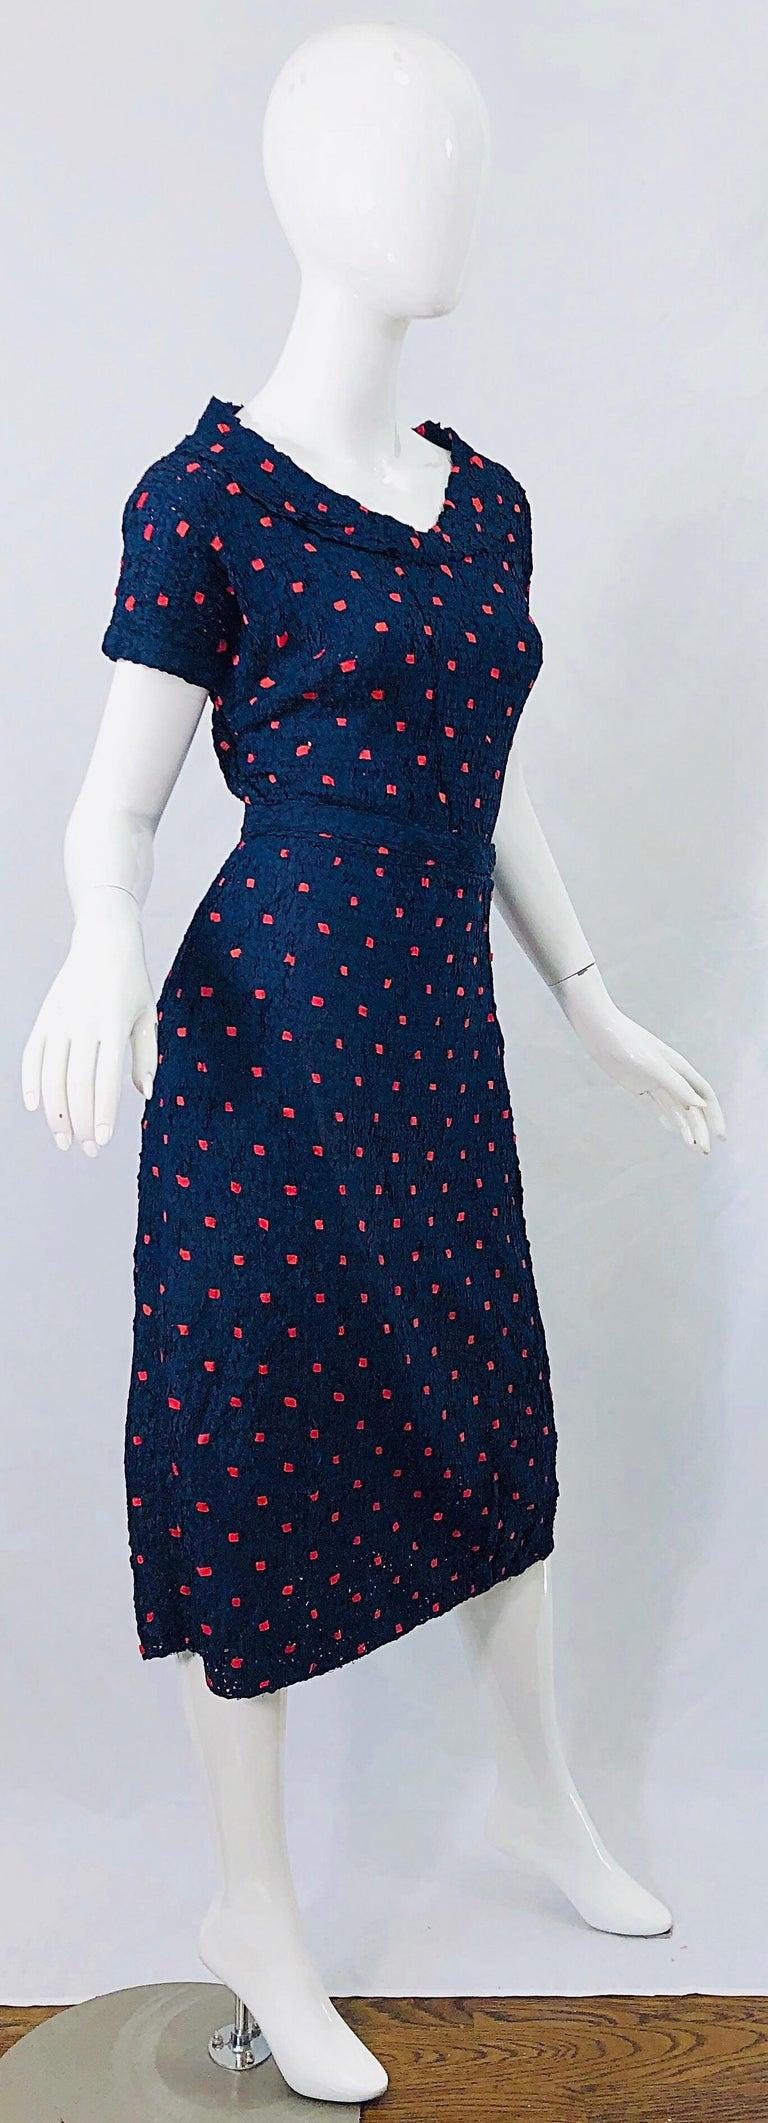 1950s Ann Fleischer for I Magnin Hand Ribbon Knit Navy Blue + Red Vintage Dress For Sale 5